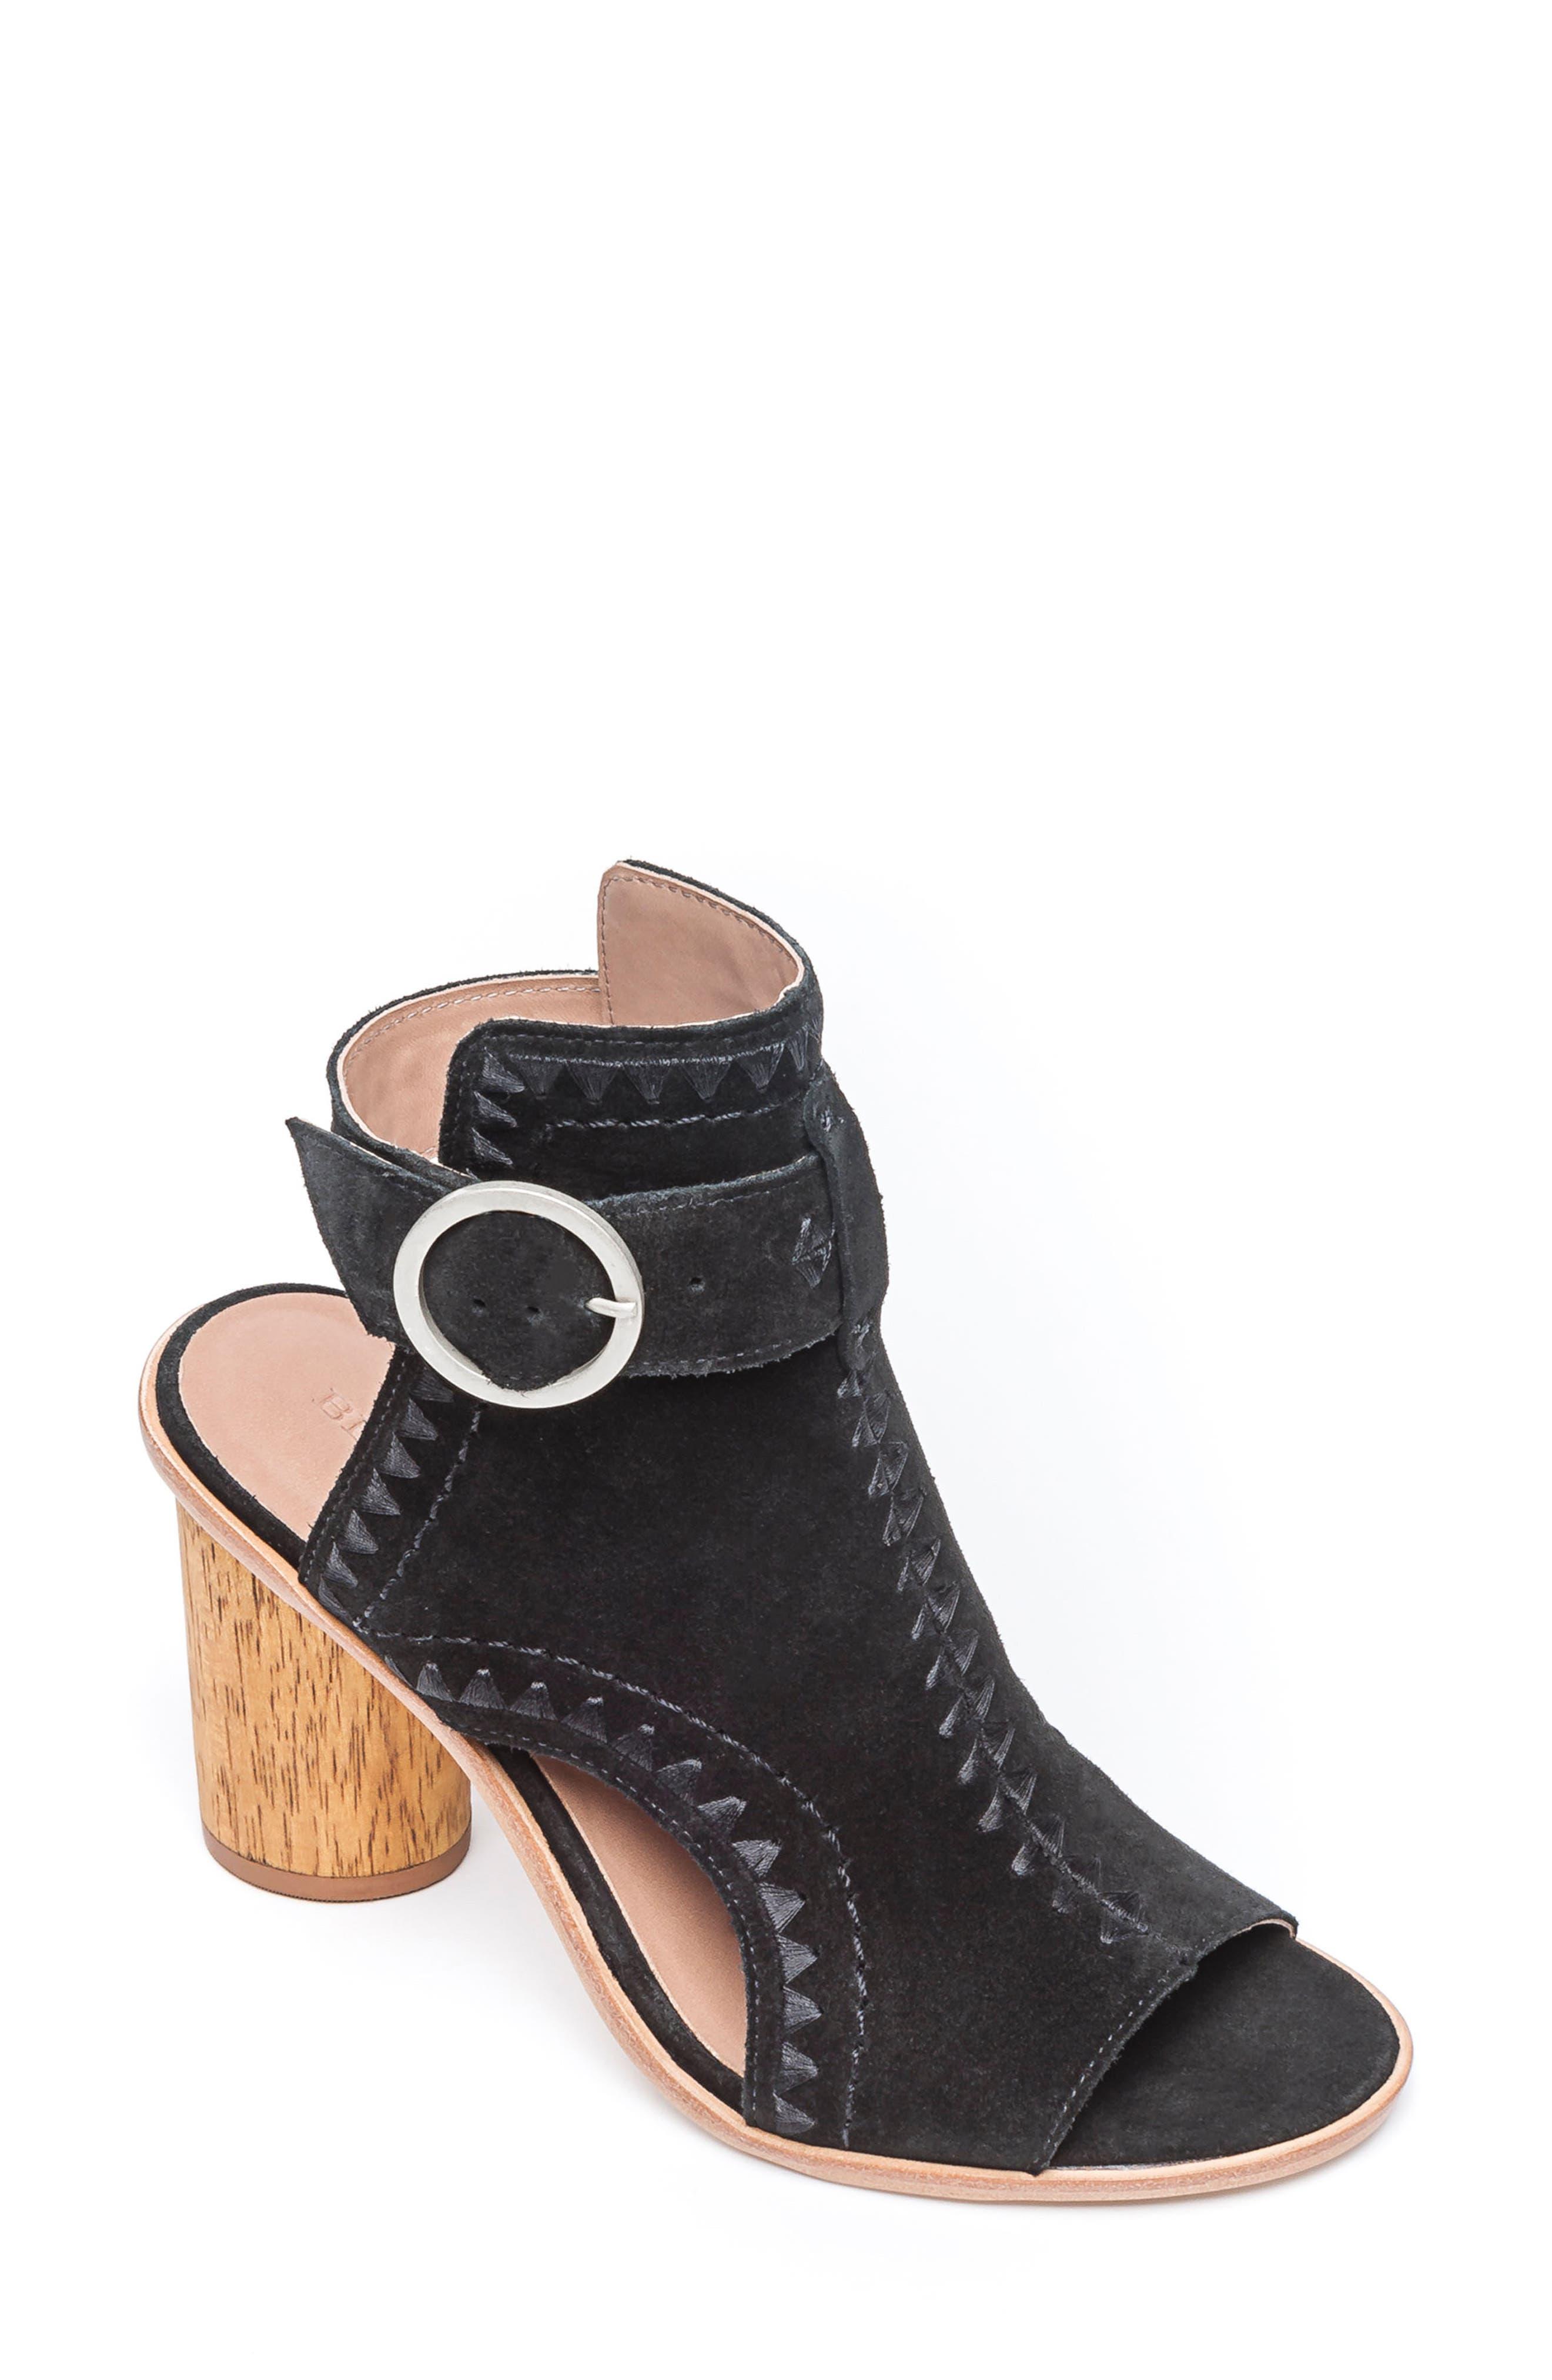 BERNARDO, Harper Embroidered Sandal, Main thumbnail 1, color, BLACK LEATHER